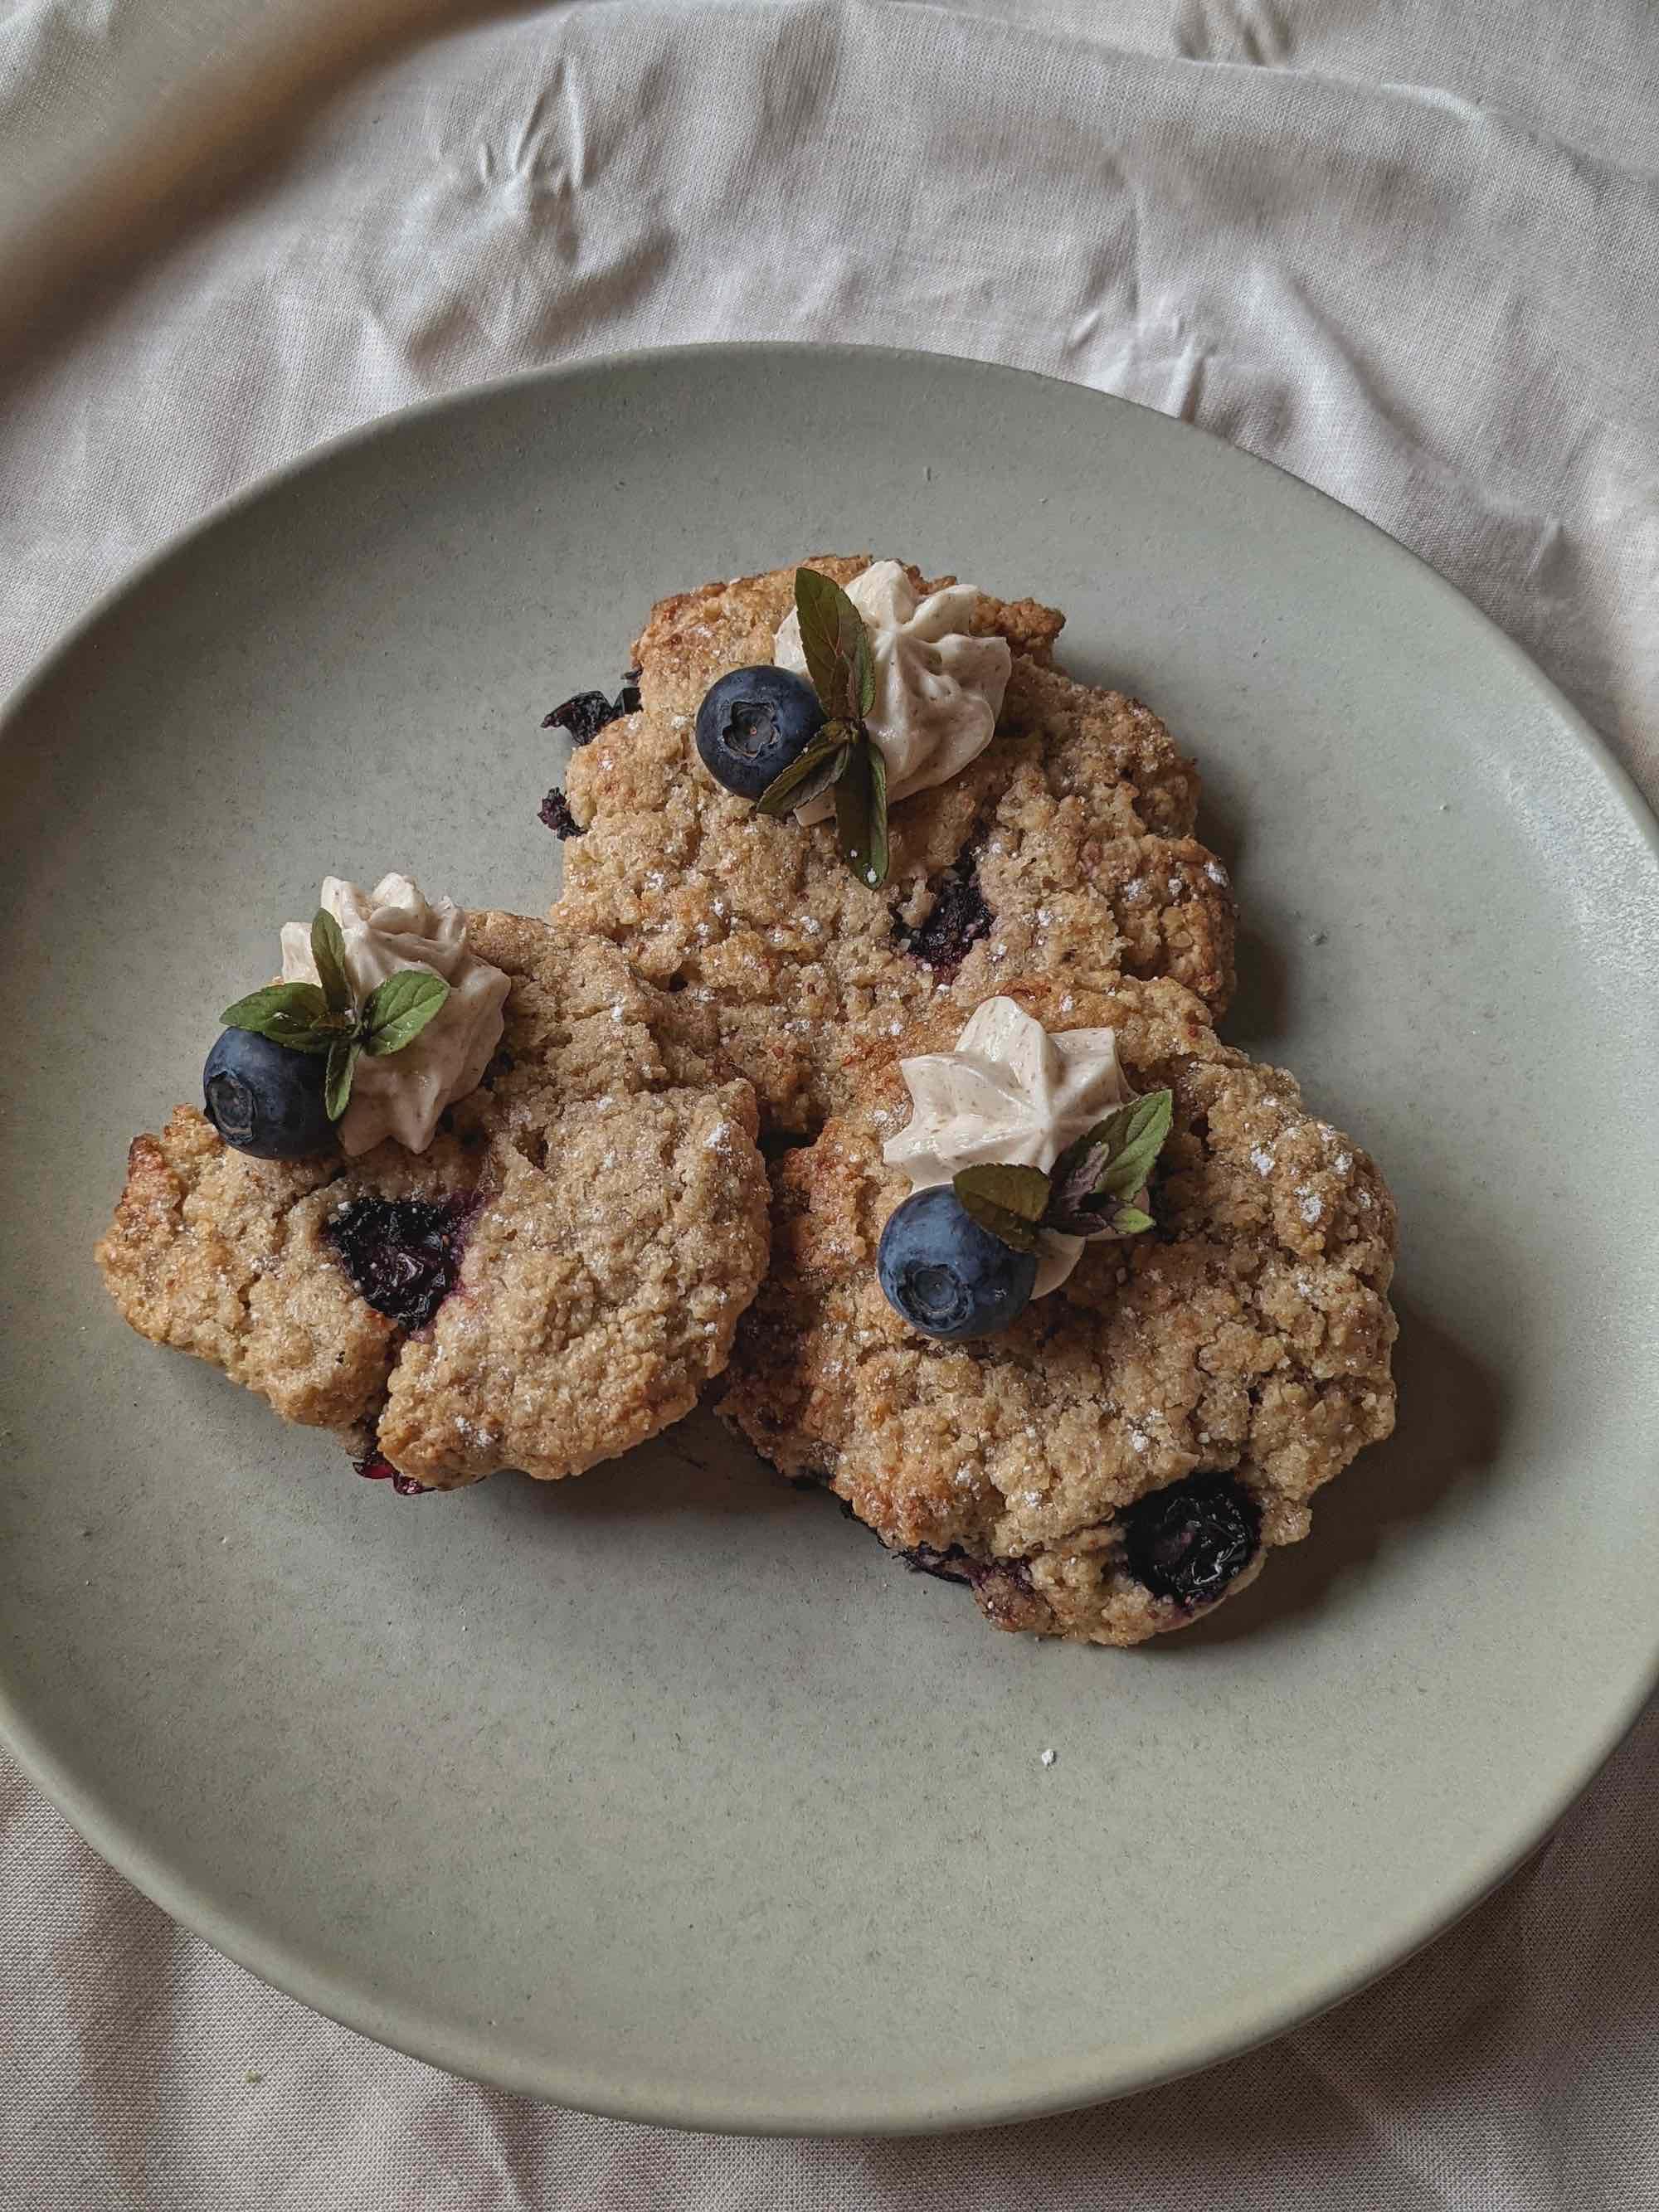 Blueberry Cookies with Elderflower Cream